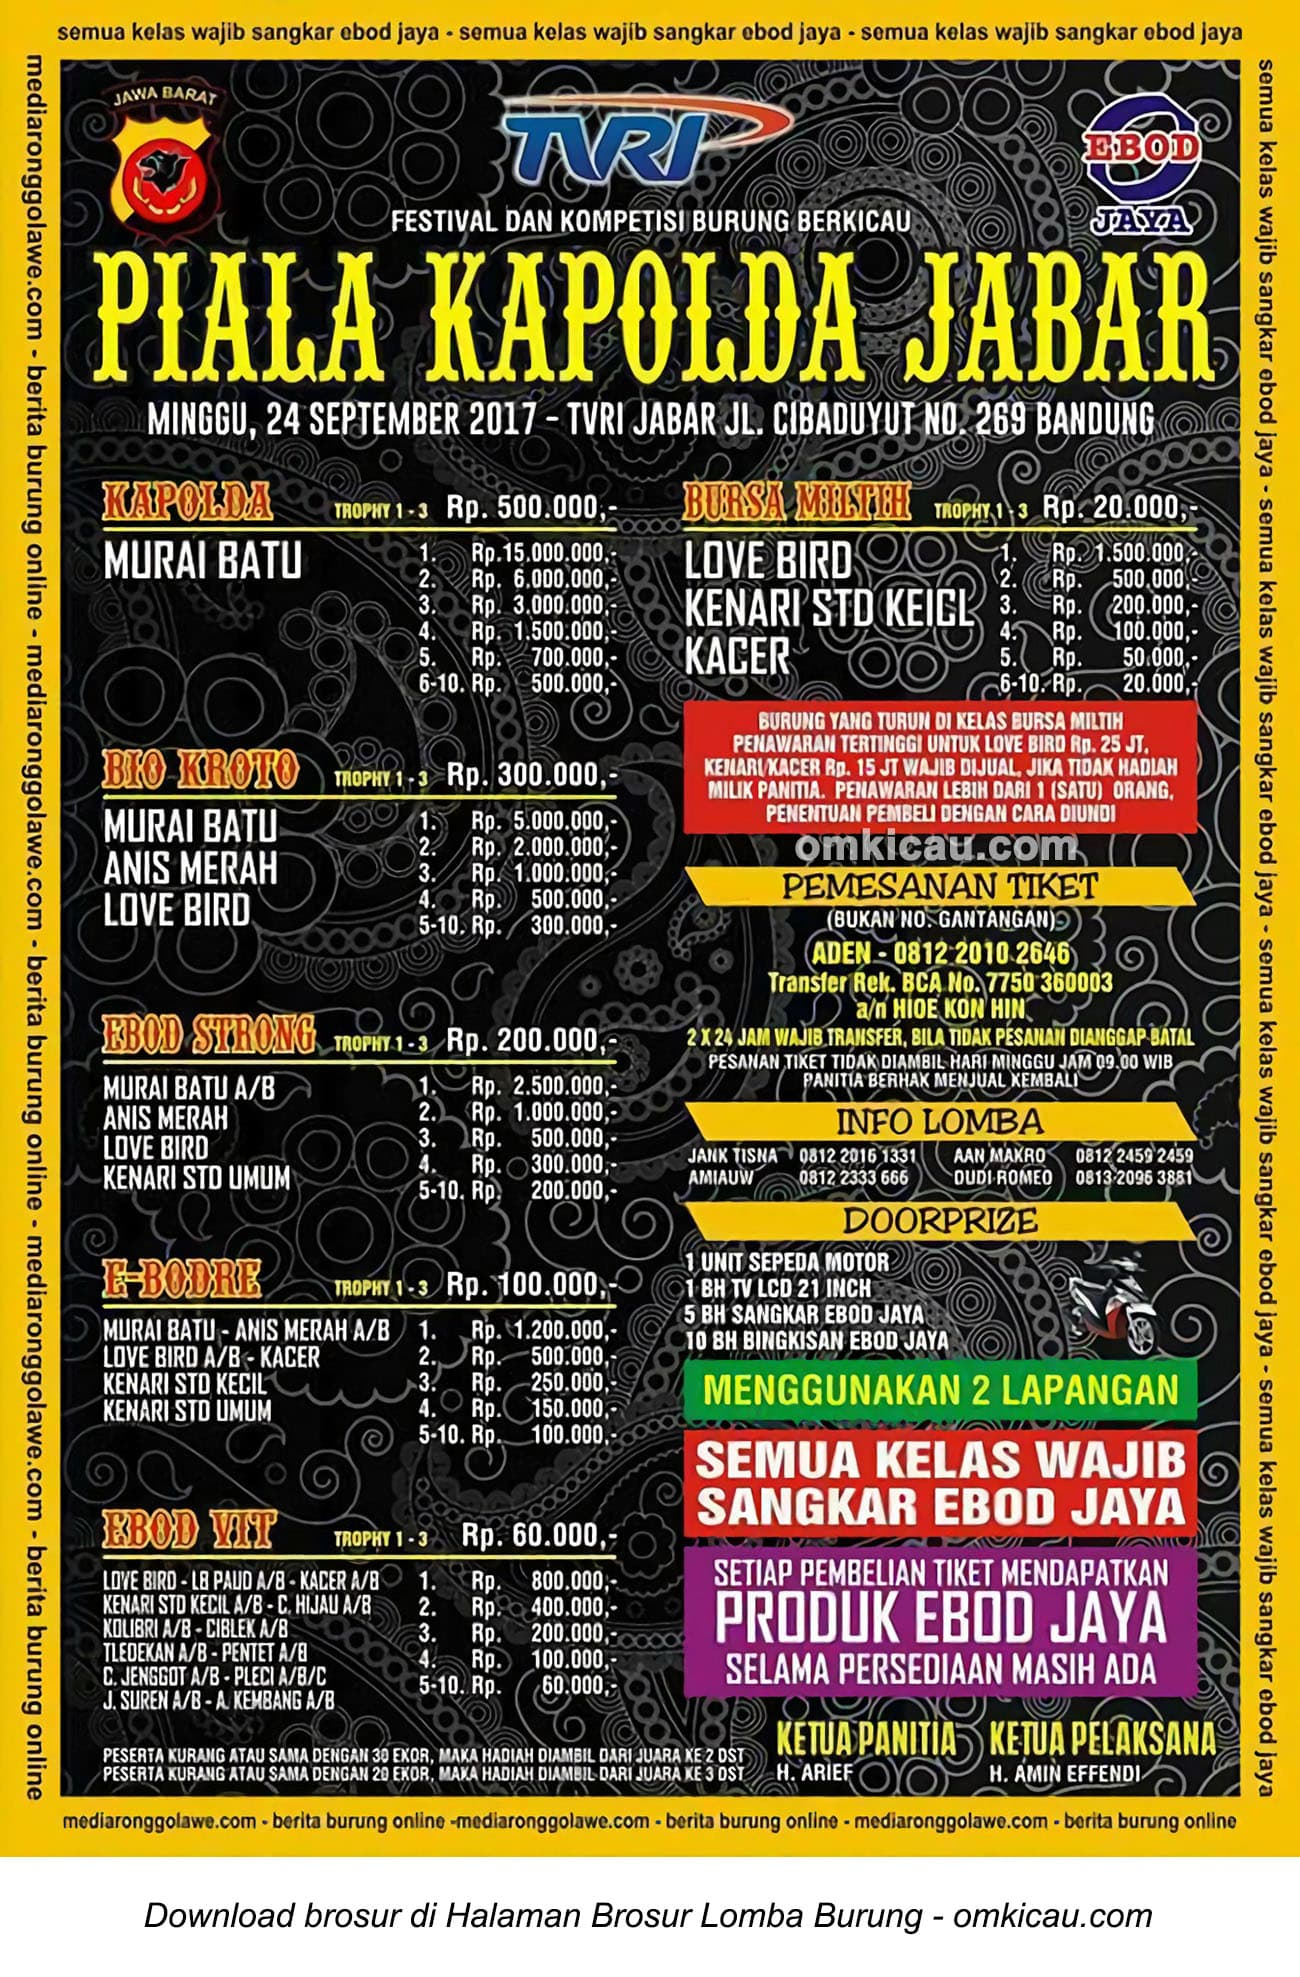 Indonesia pk kudus - 1 part 8